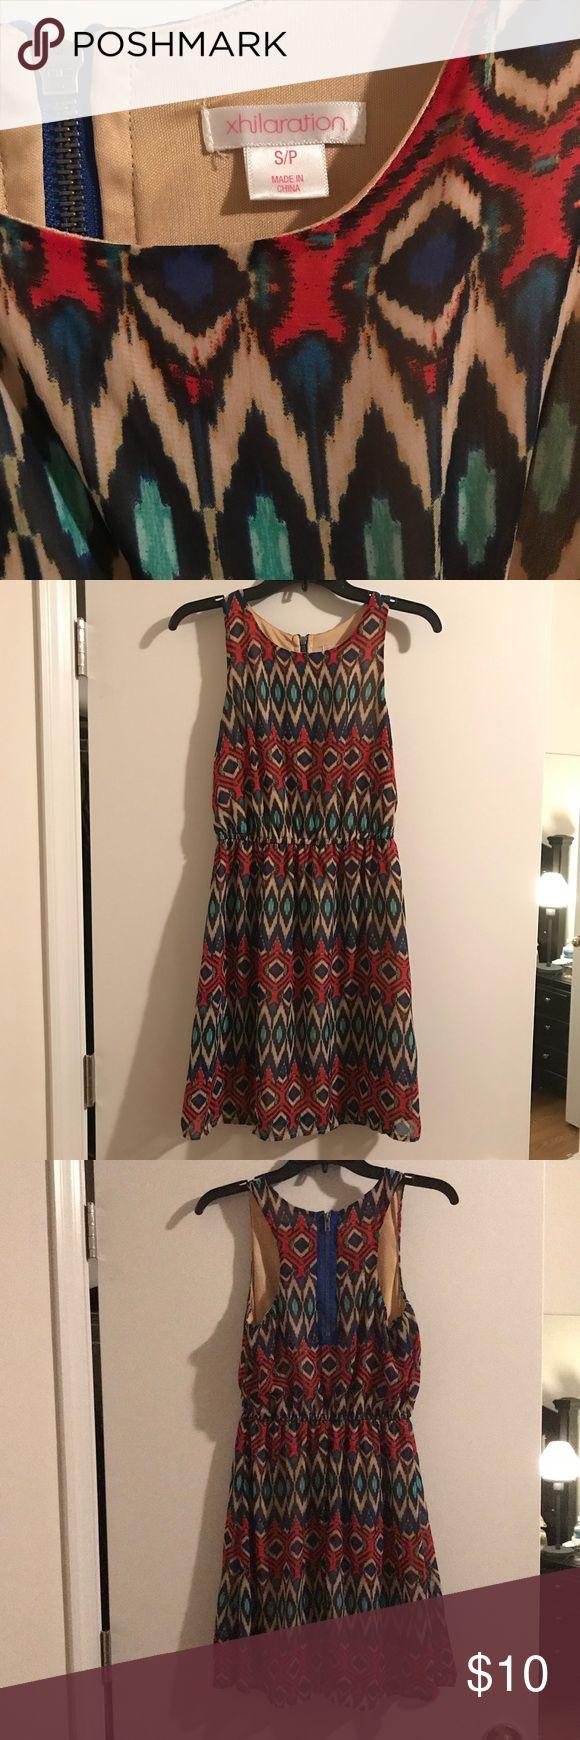 Xhilaration Aztec racetrack dress This adorable Aztec print dress is perfect for a summer evening out. Xhilaration Dresses Mini